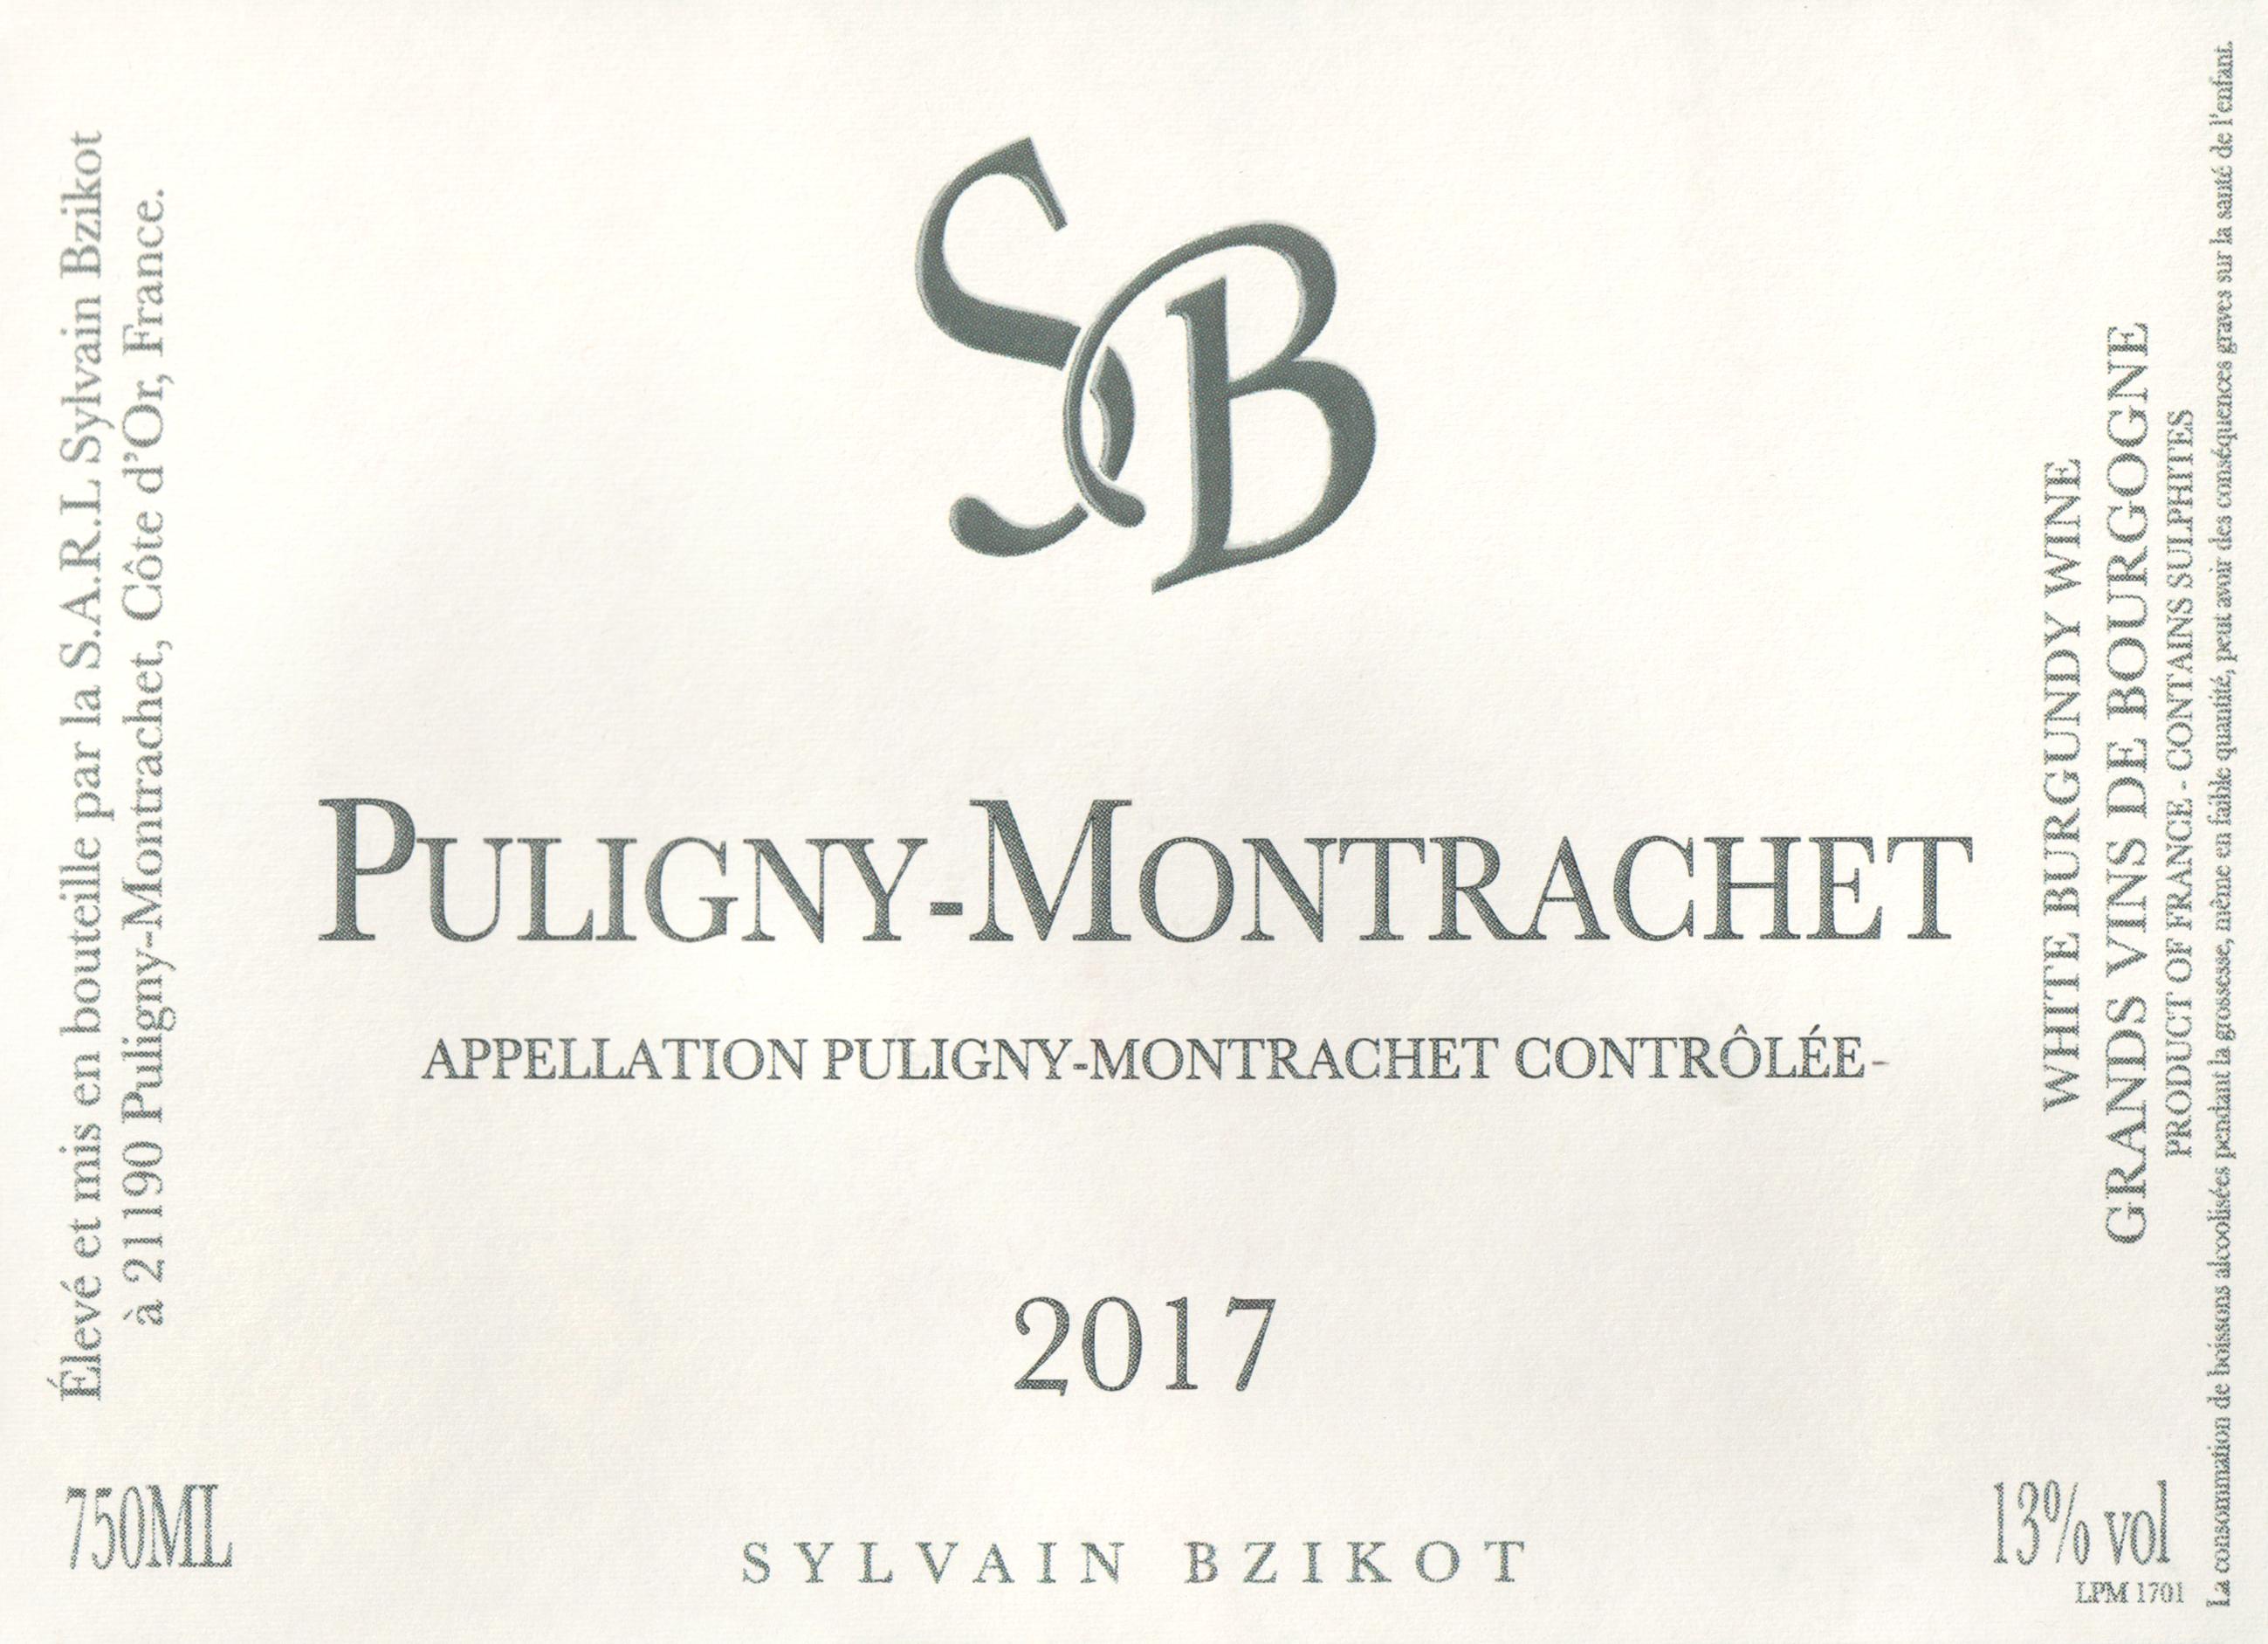 Bzikot Puligny Montrachet 2017